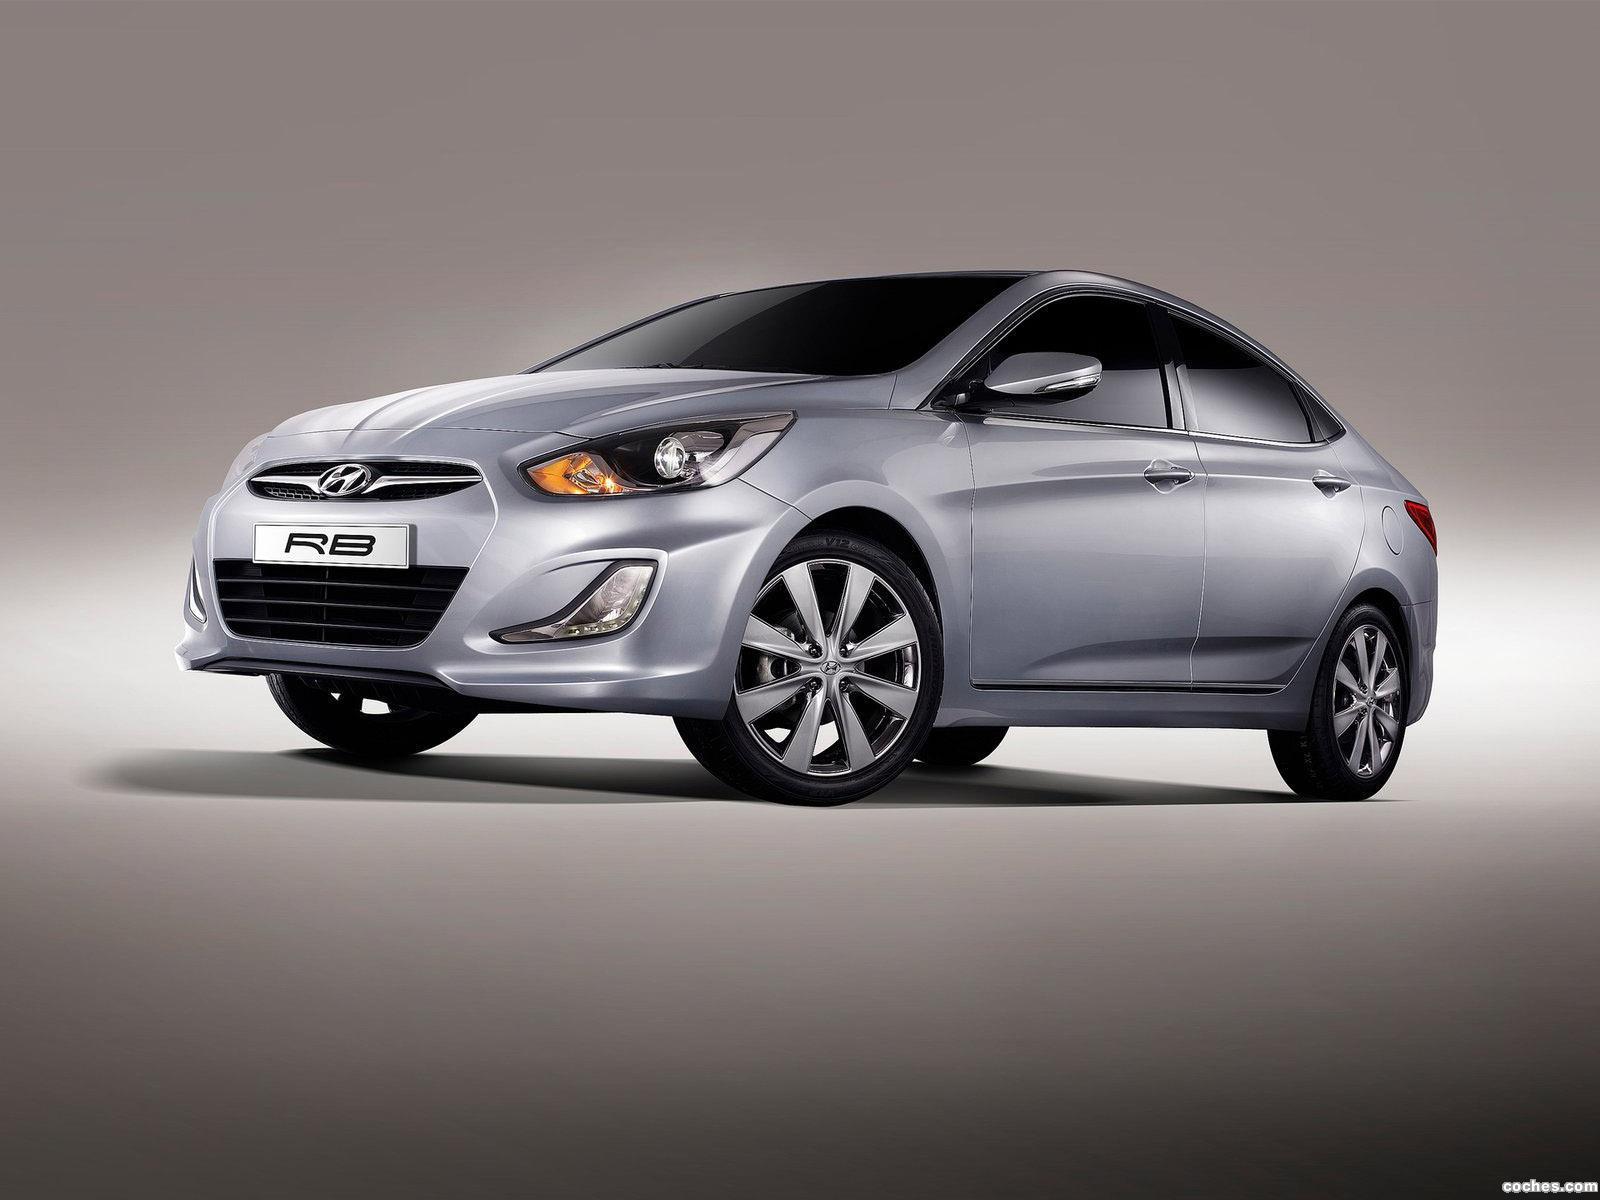 Foto 0 de Hyundai RB Concept 2010